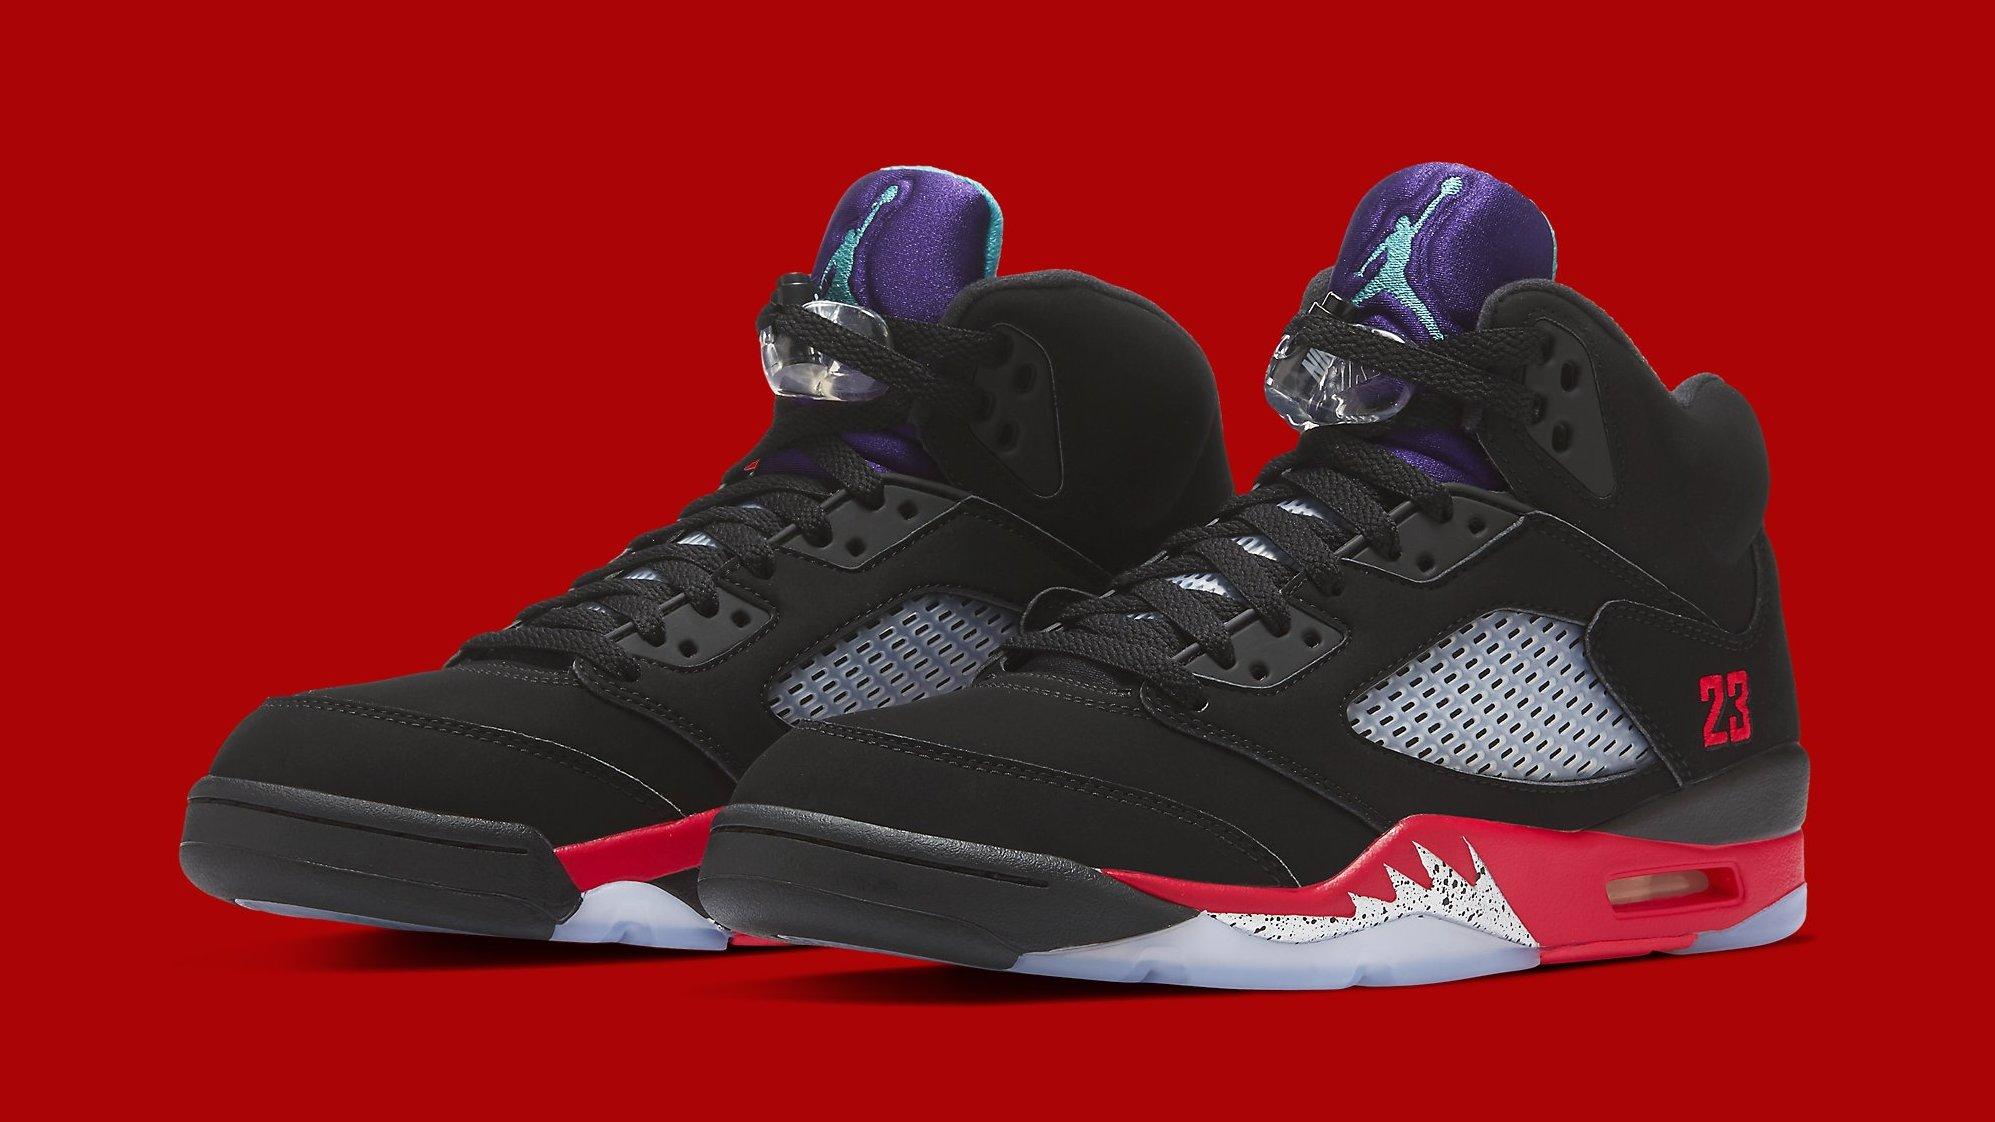 Air Jordan 5 Retro 'Top 3' Release Date CZ1786-001 | Sole Collector